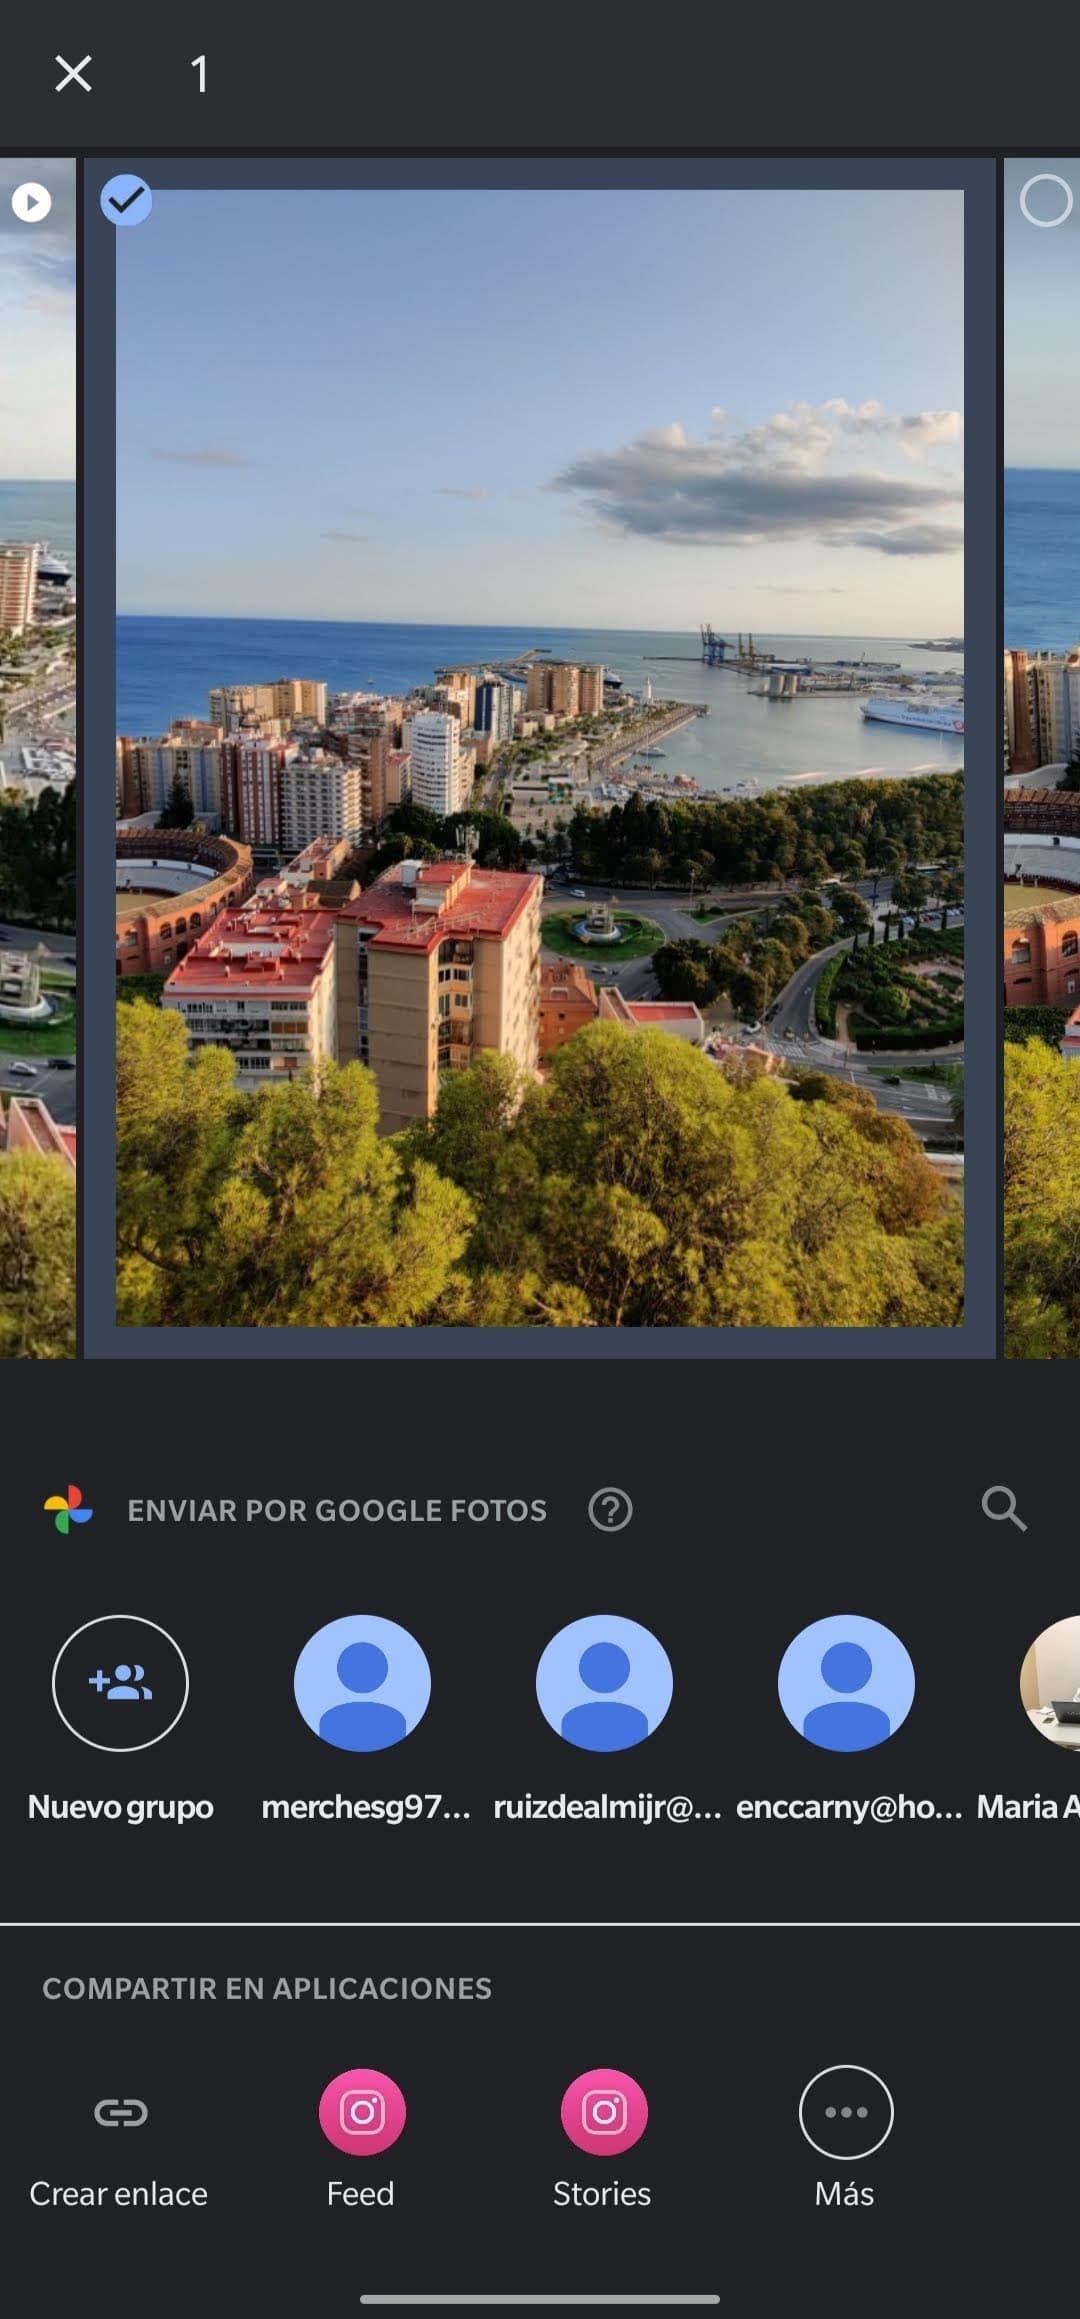 google fotos actualización menú compartir